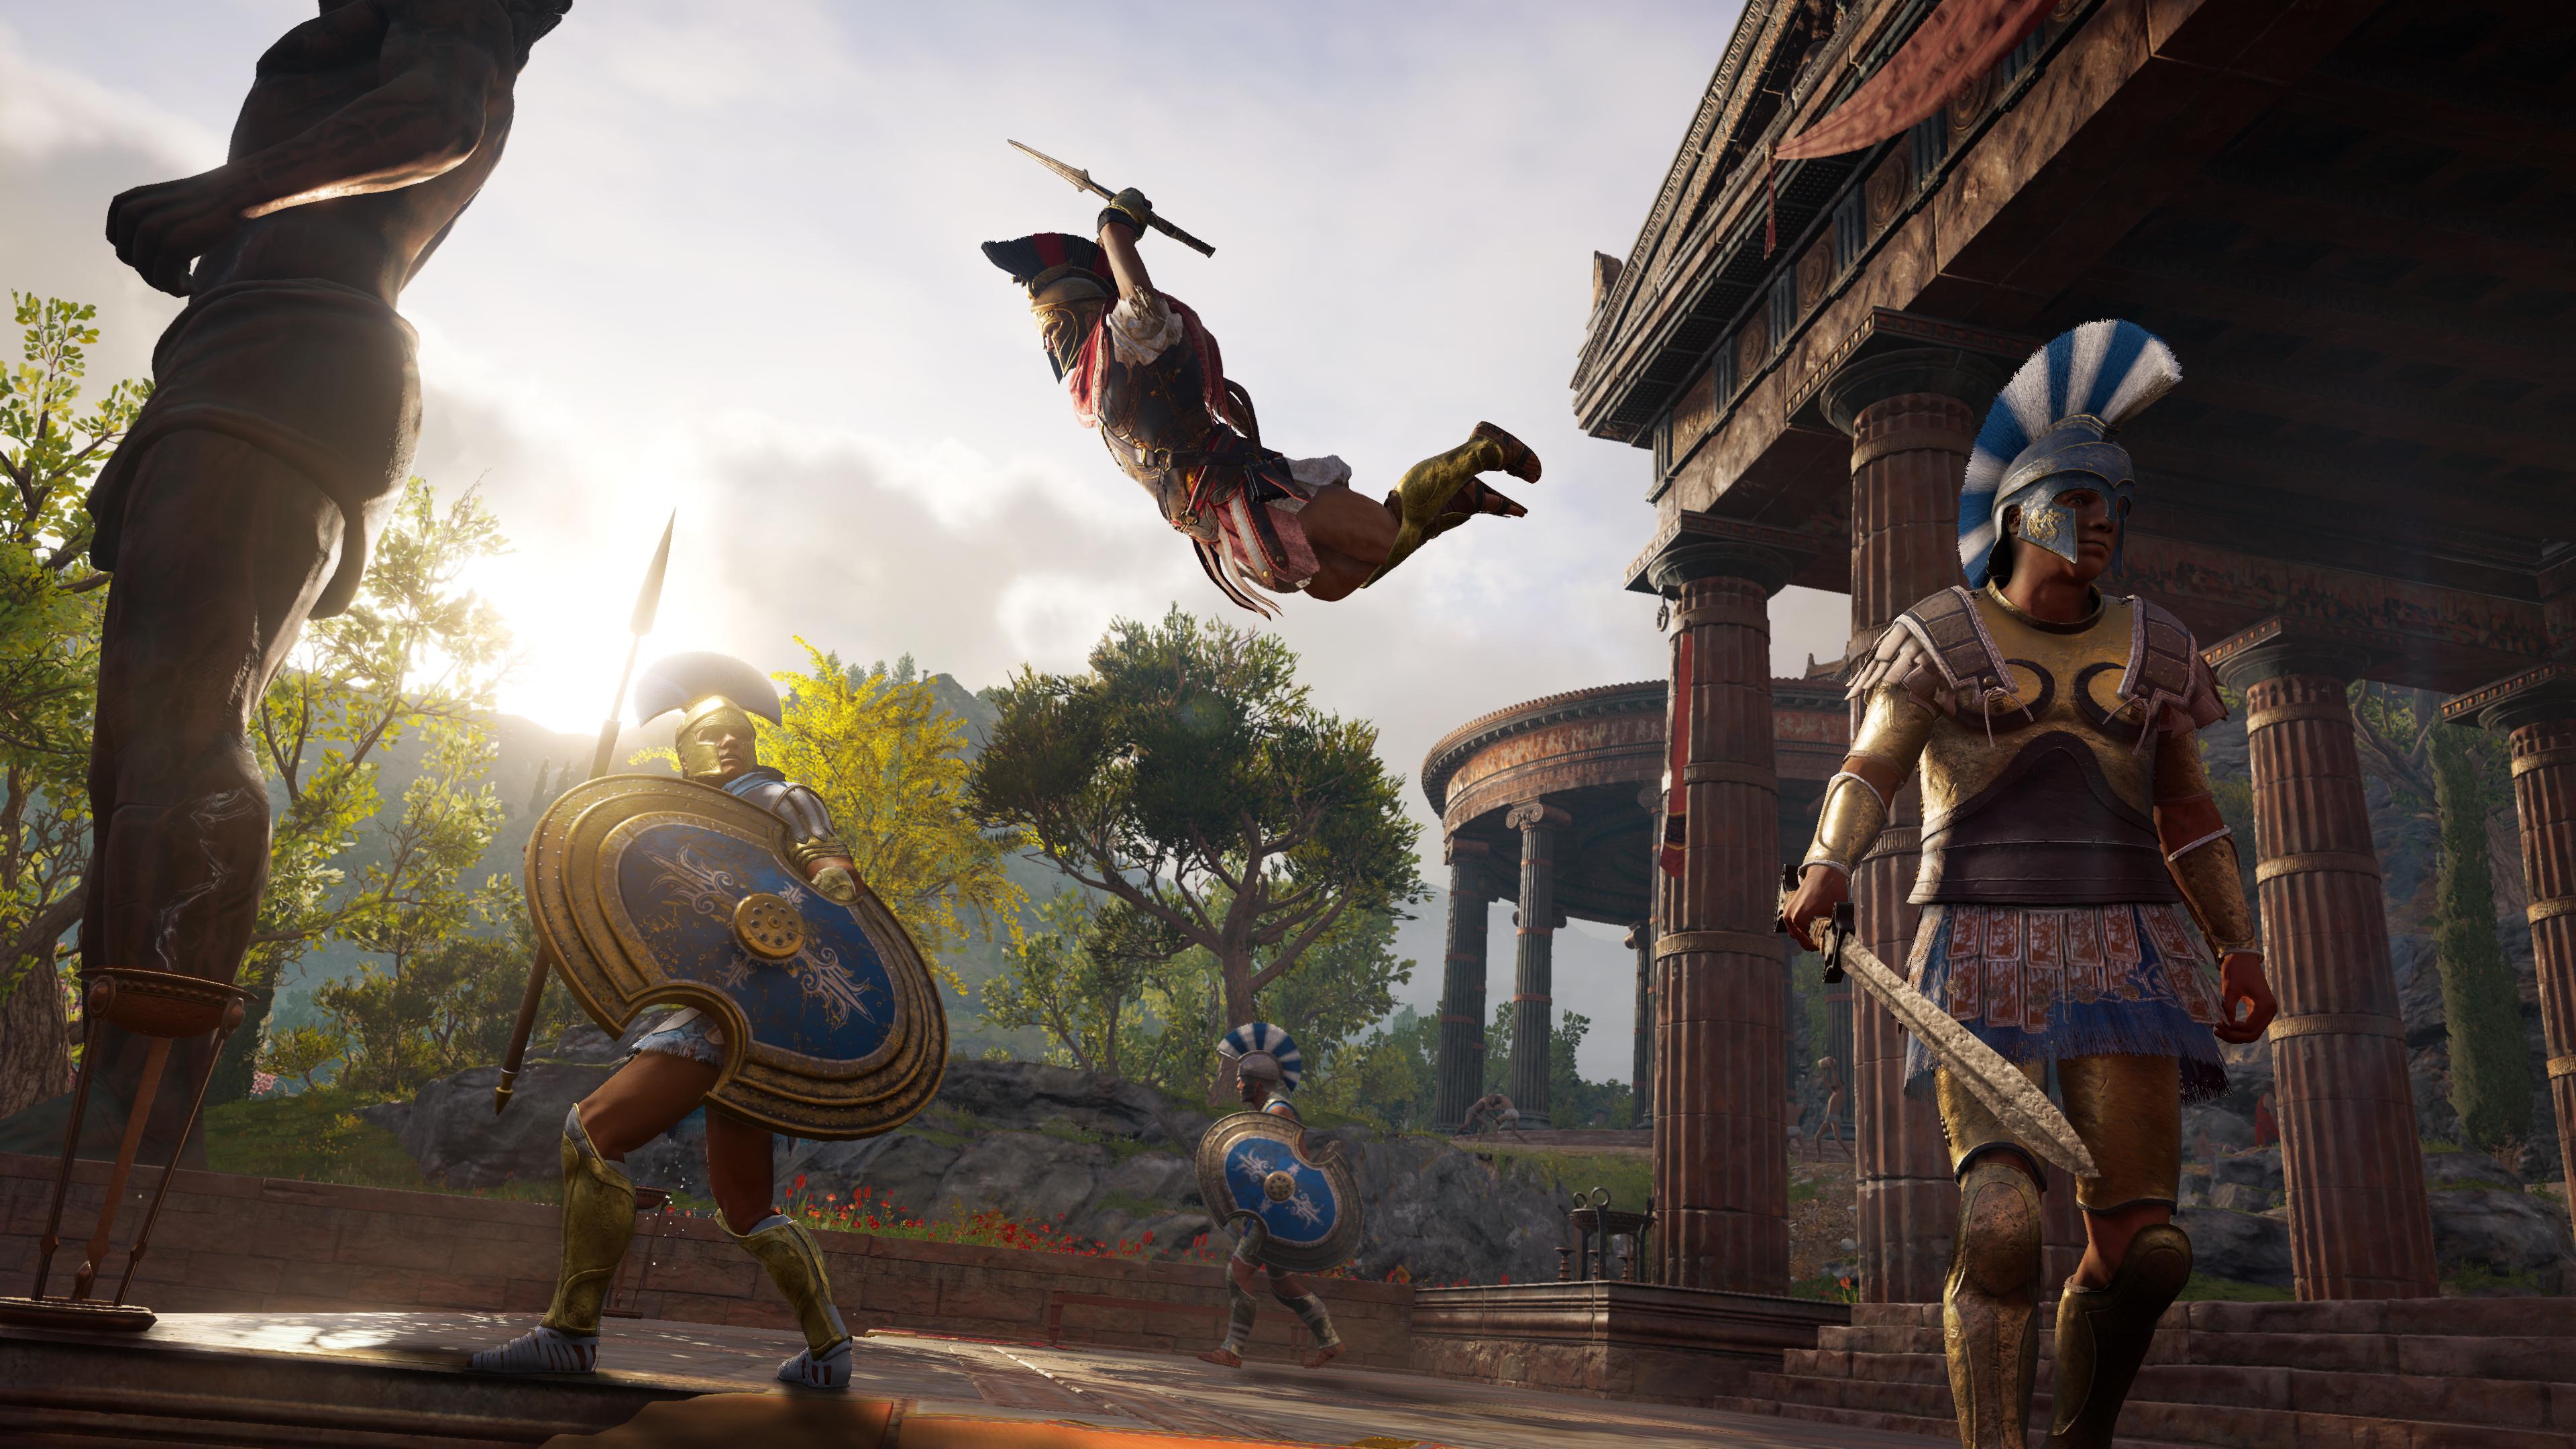 Assassins_Creed_Odyssey_screen_JumpAttack_E3_110618_230pm_1528723946